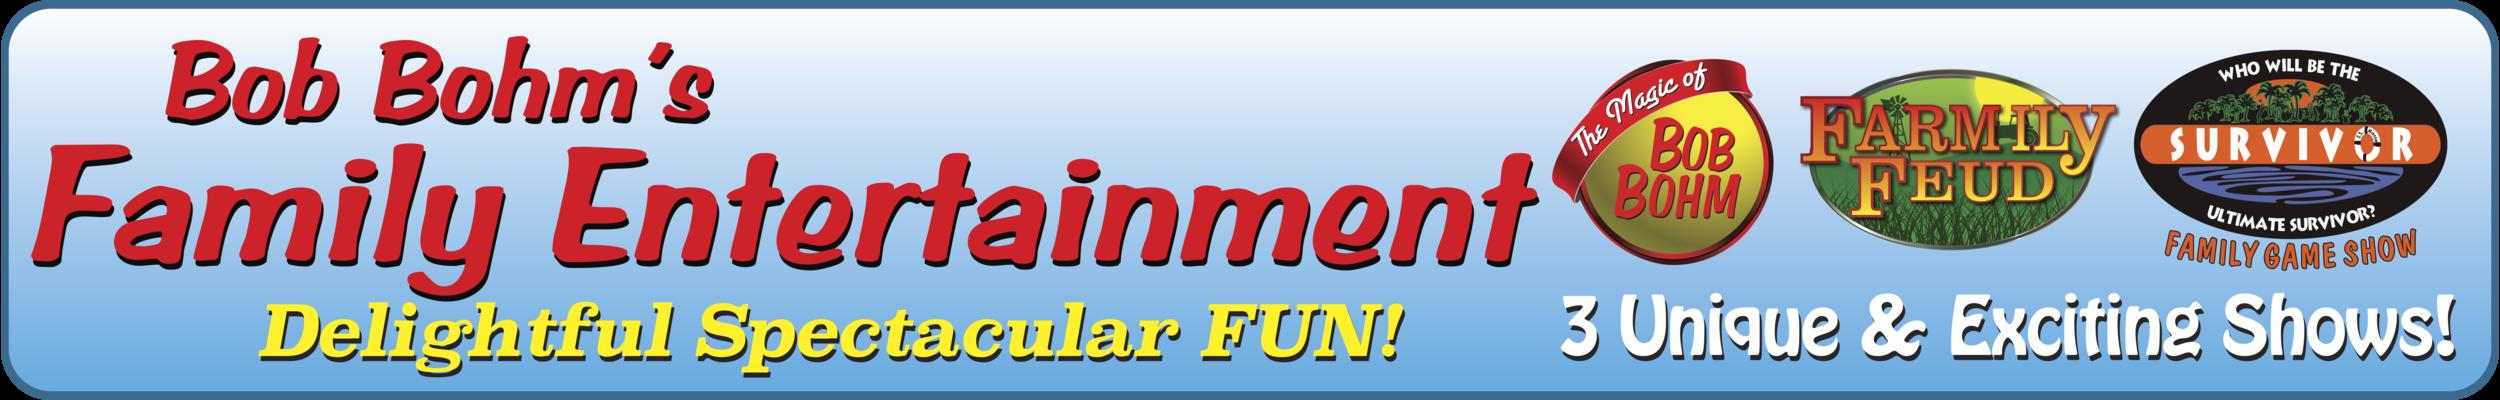 Bob Bohm Family Entertainment banner.png